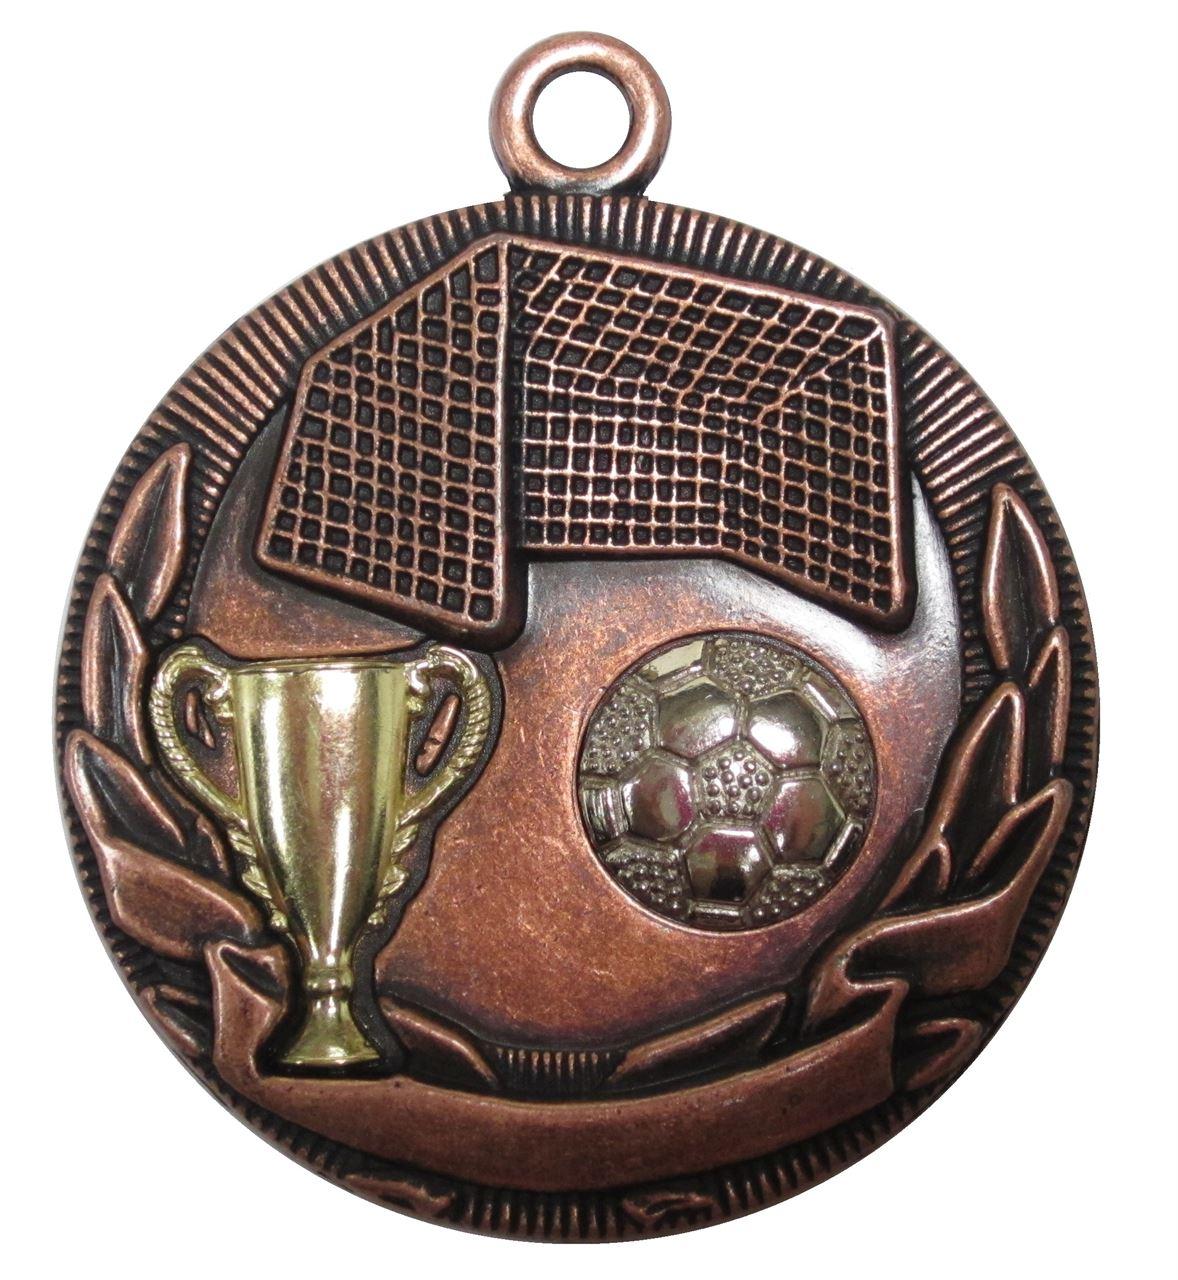 Copper Cup Design Football Medal (size: 50mm) - D3FB